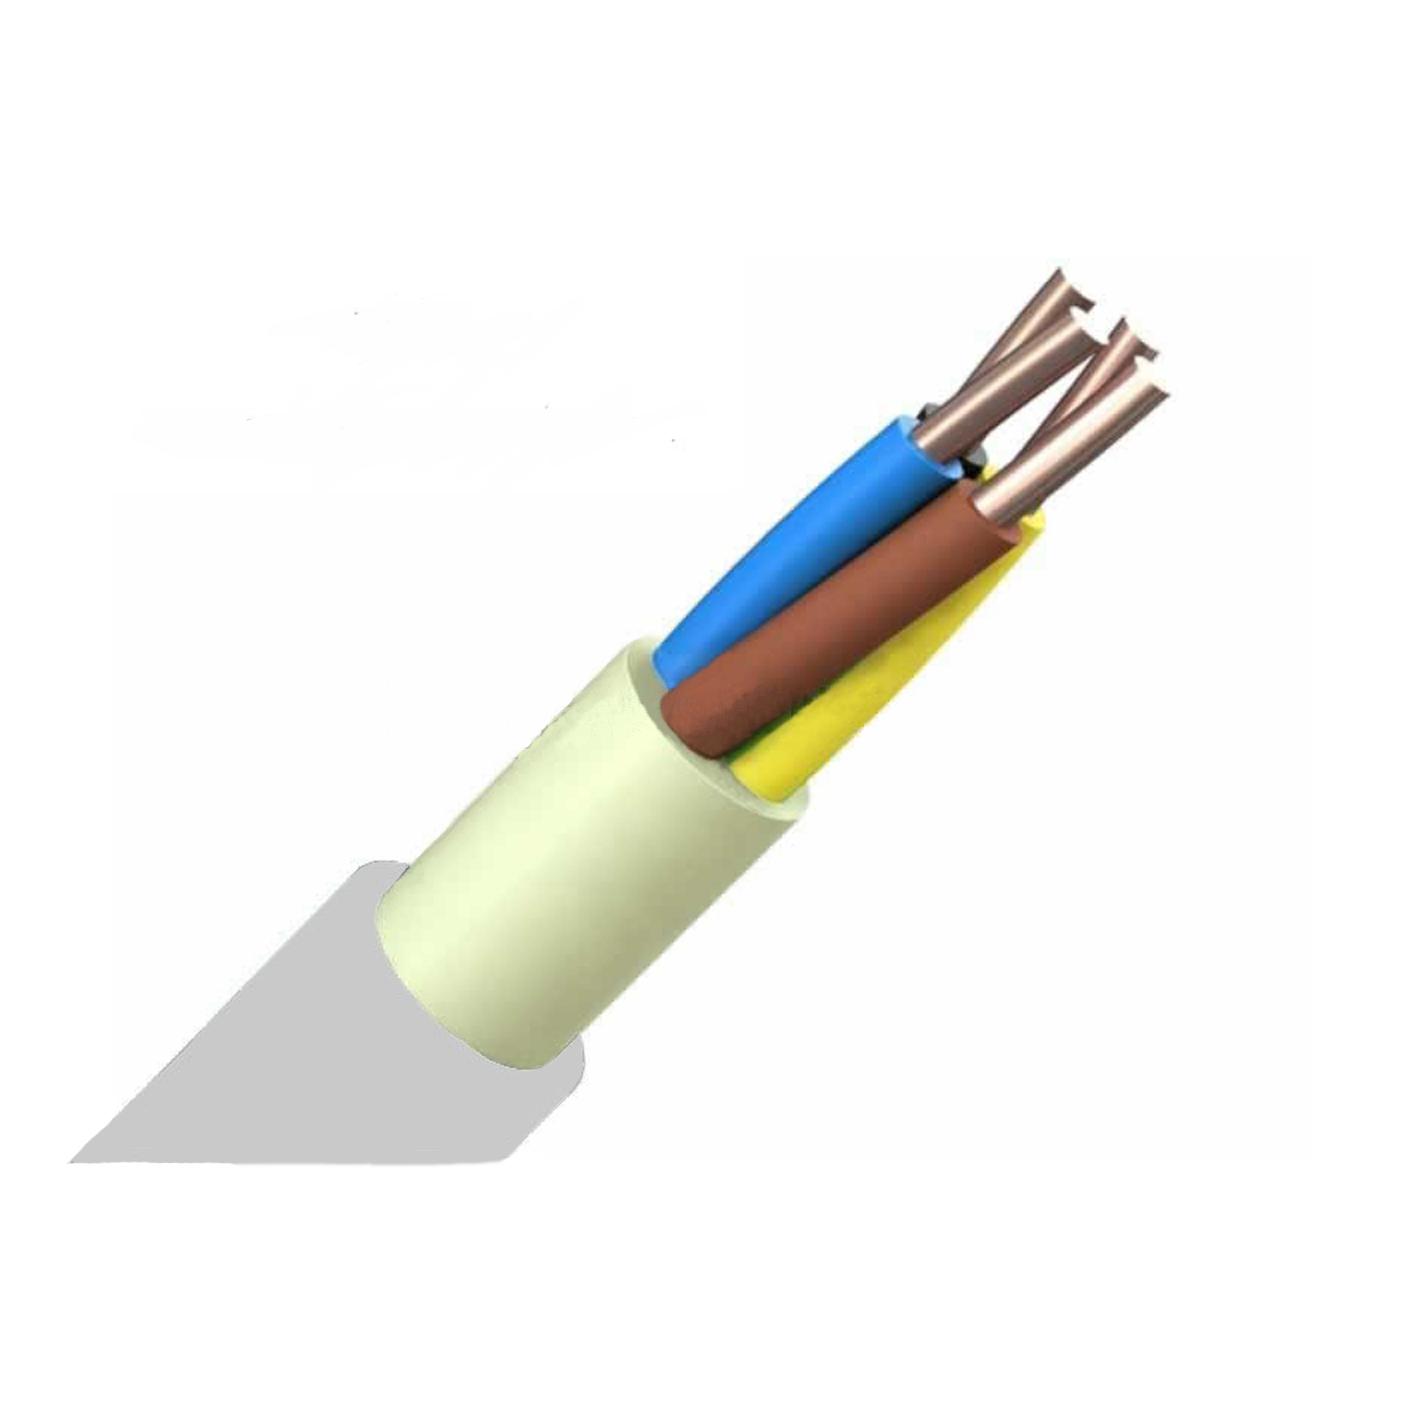 Öznur 4x4 NYM (NVV) Kablo